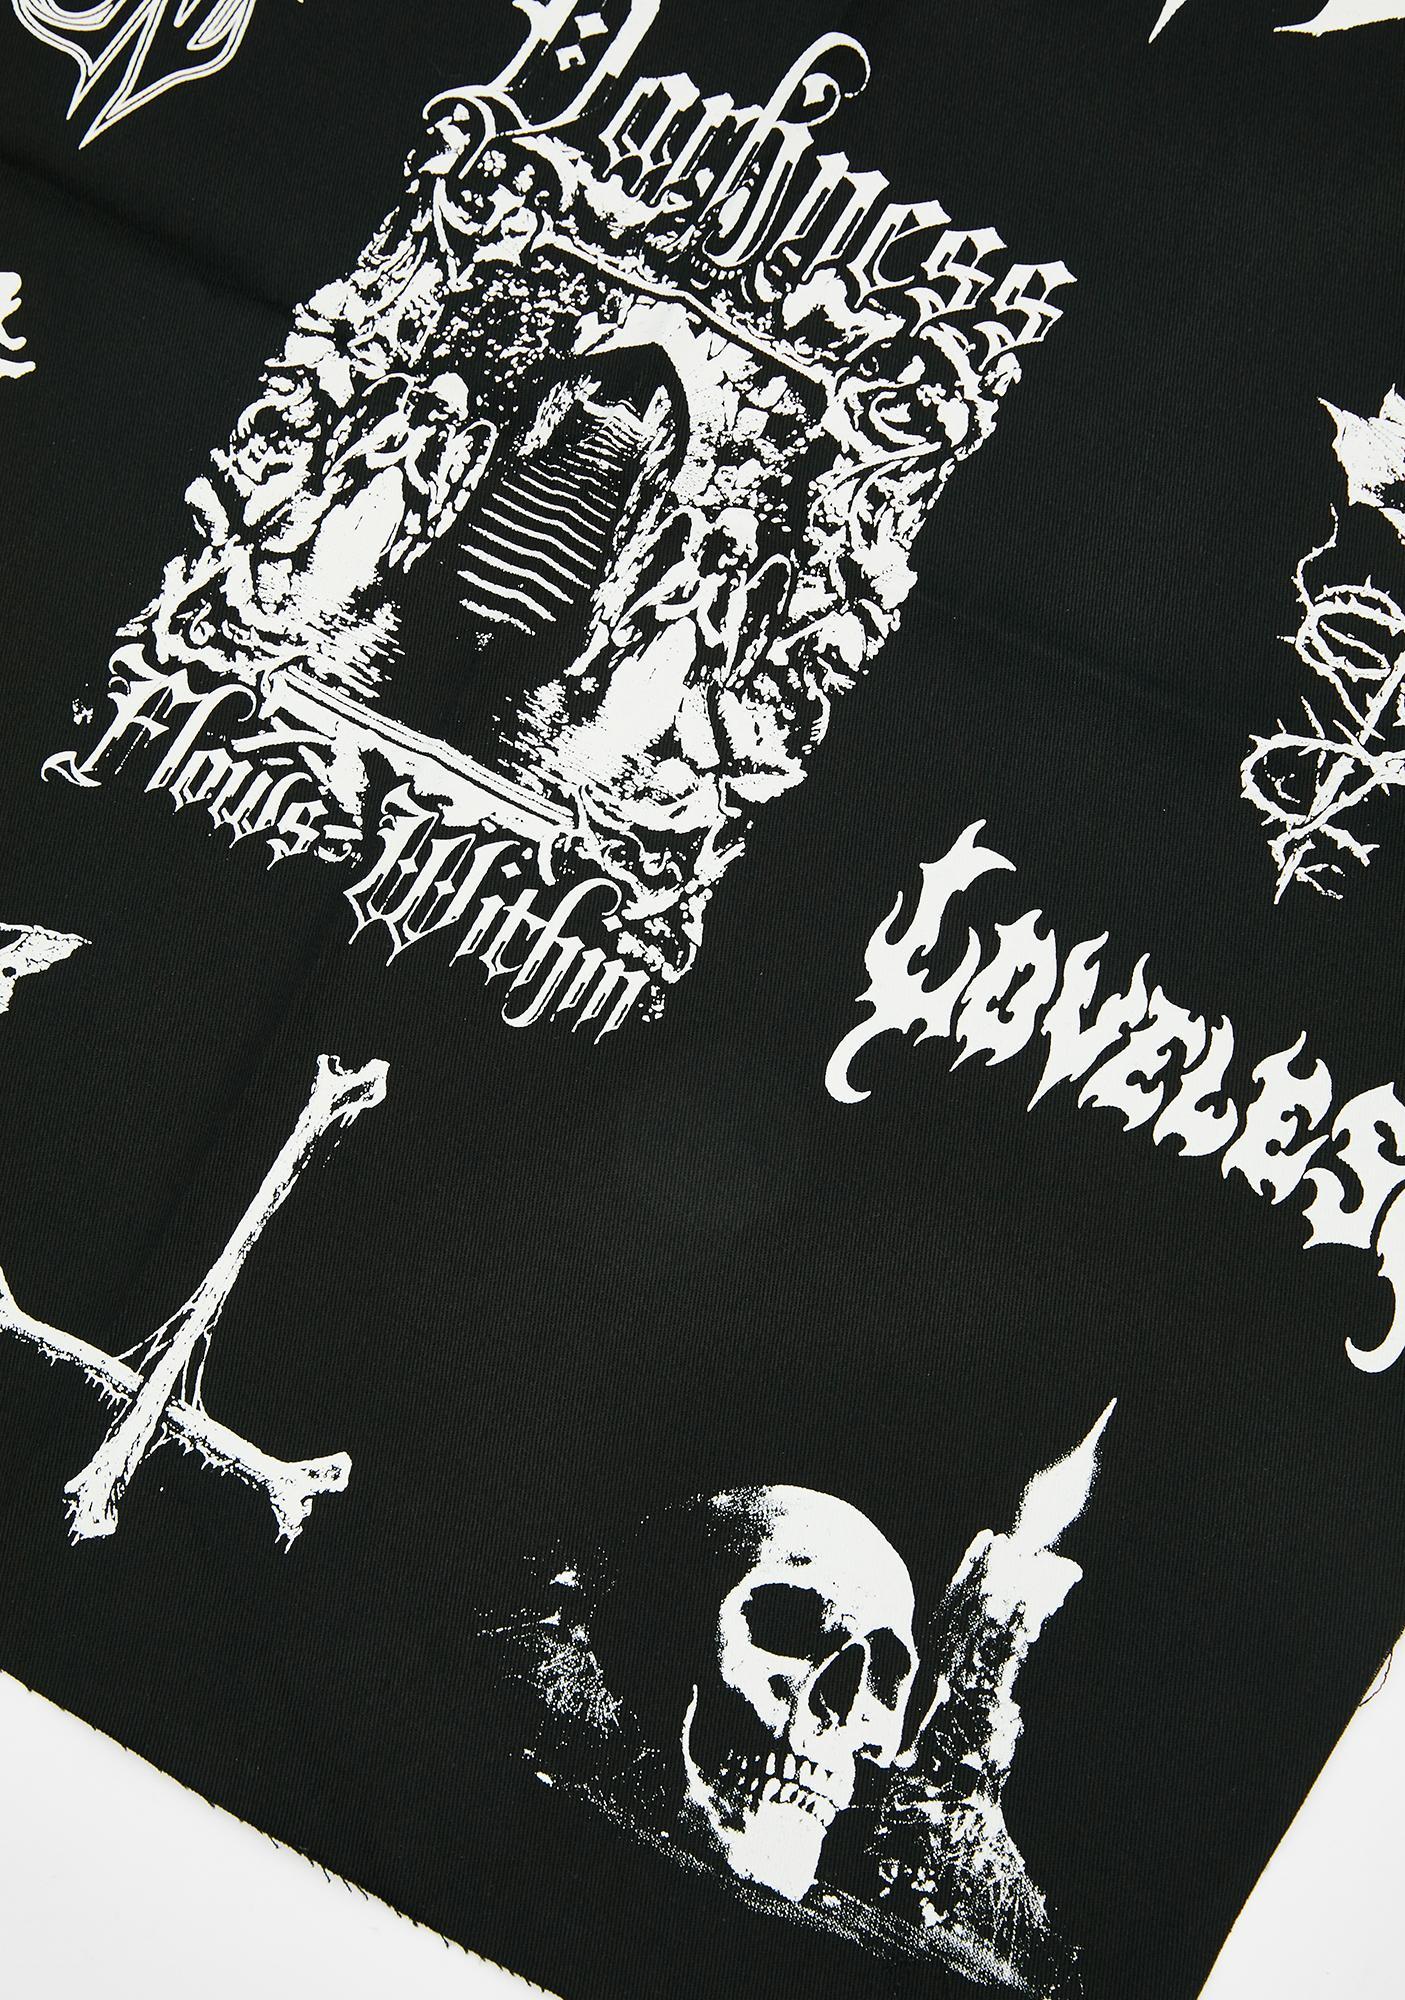 Widow Souls Of Darkness Patch Set